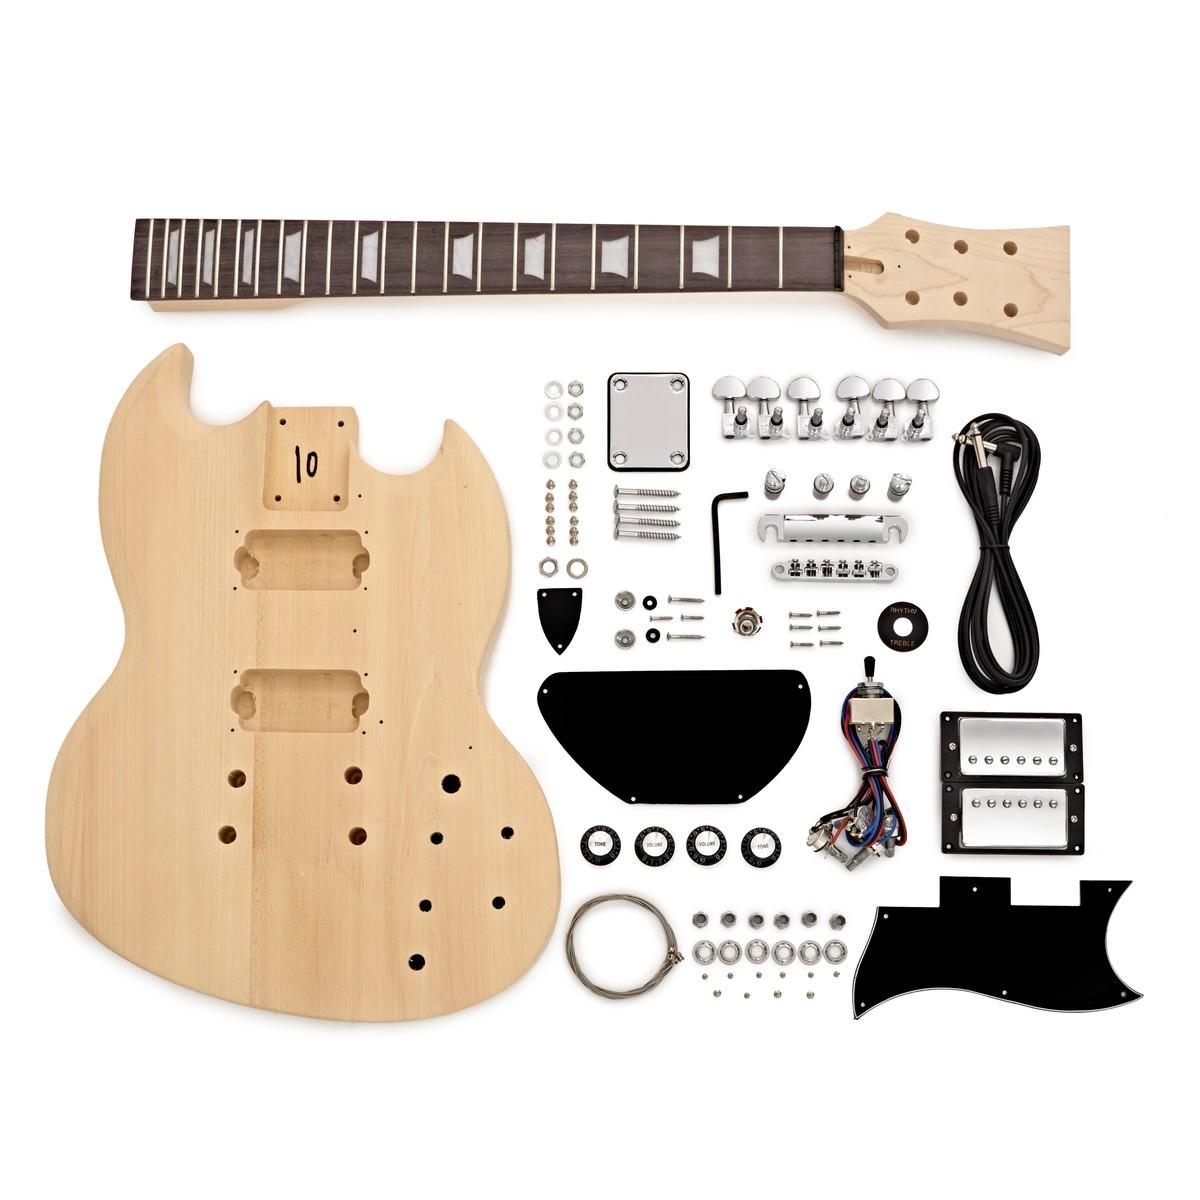 brooklyn electric guitar diy kit b stock at gear4music. Black Bedroom Furniture Sets. Home Design Ideas